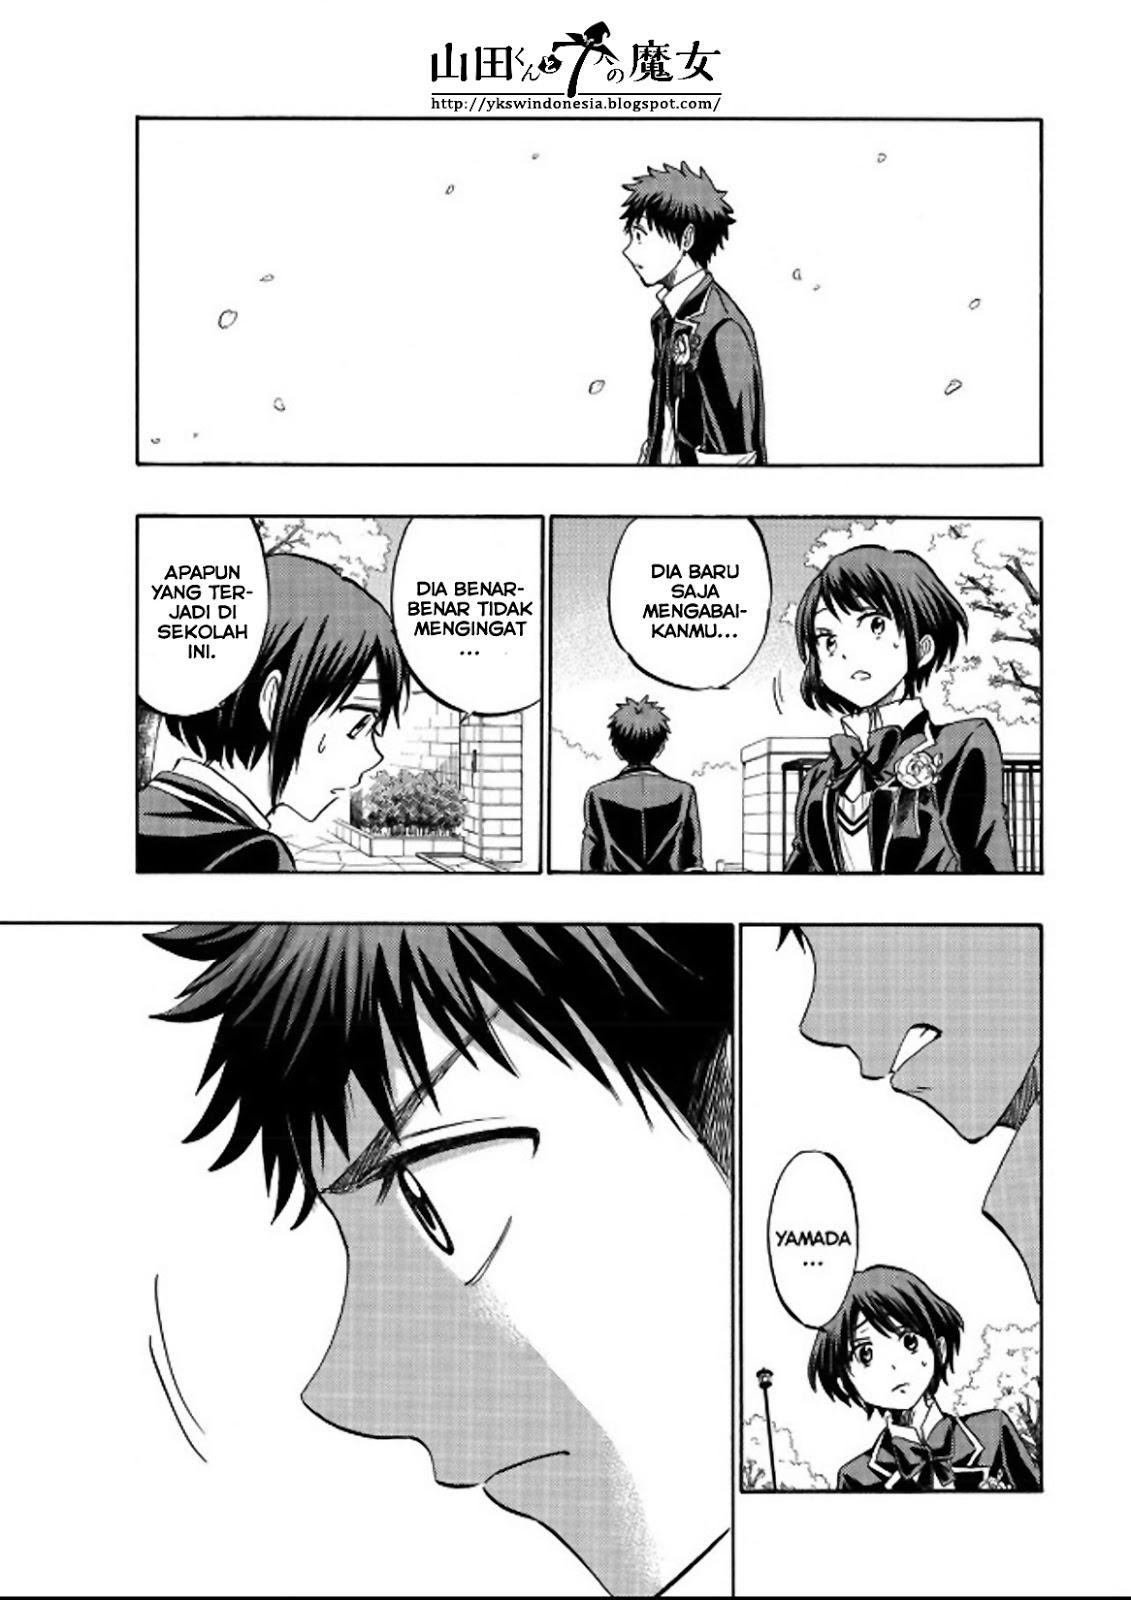 Yamada-kun to 7-nin no Majo Chapter 241-11